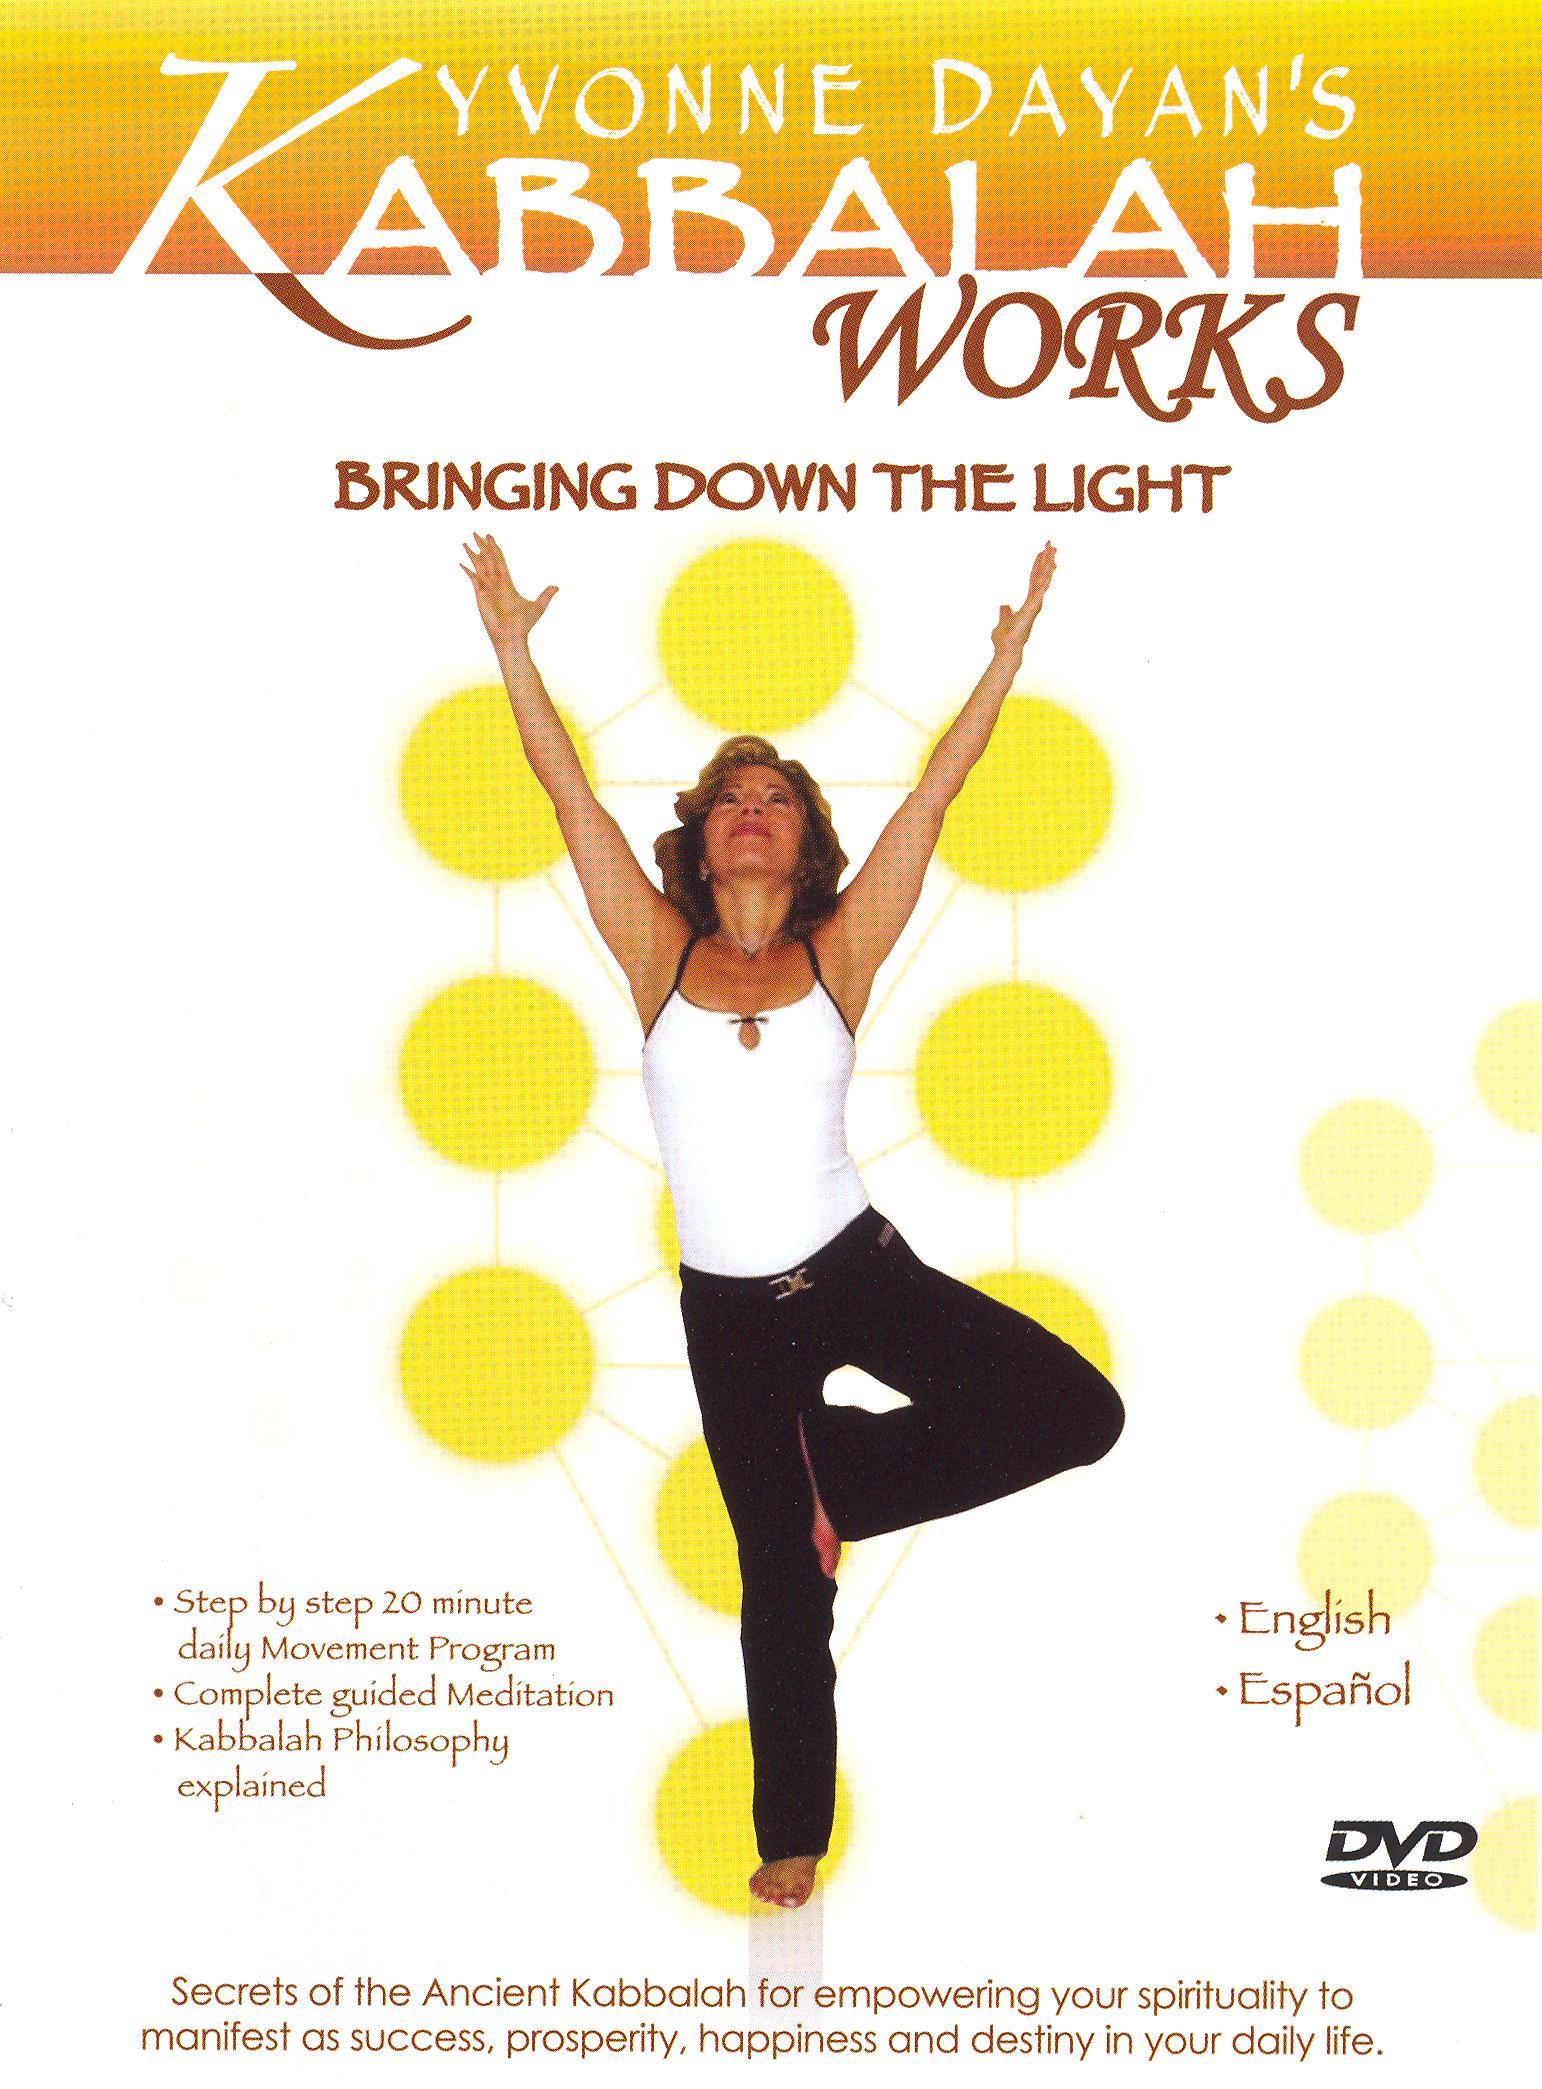 Kabbalah Yoga: Bringing Down the Light